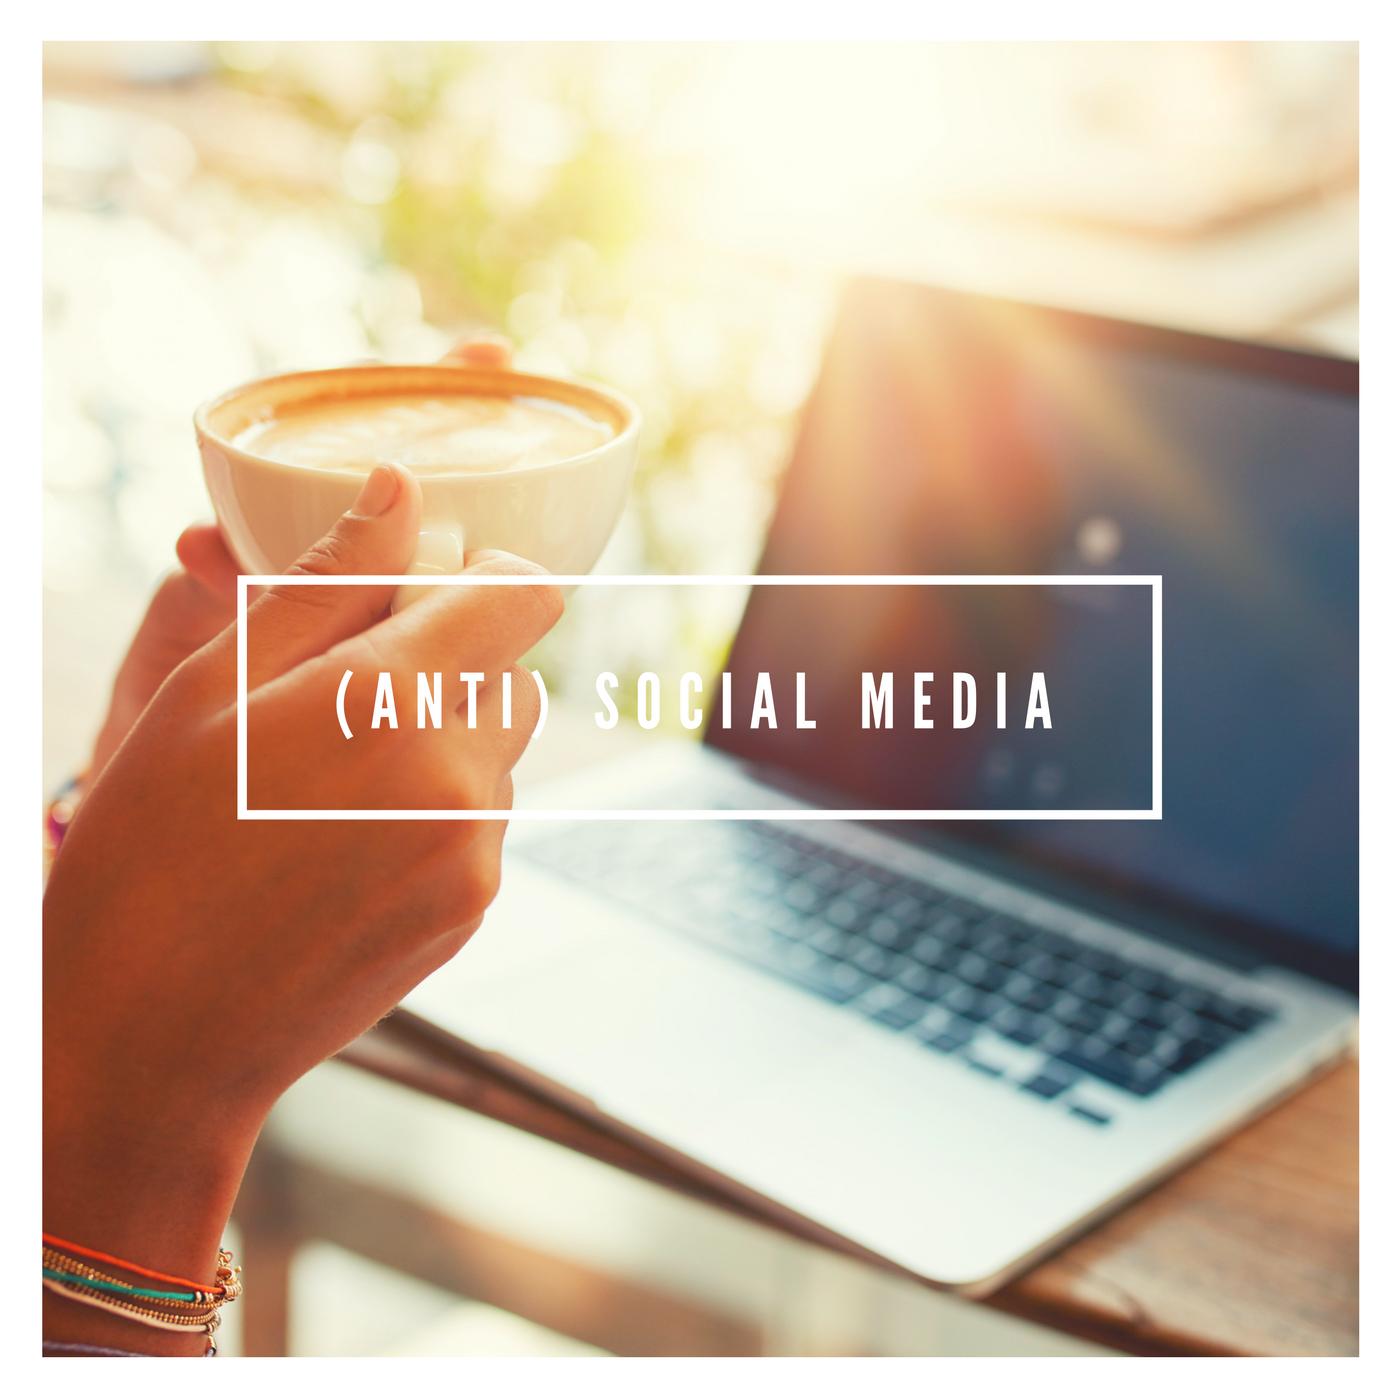 (Anti) Social Media